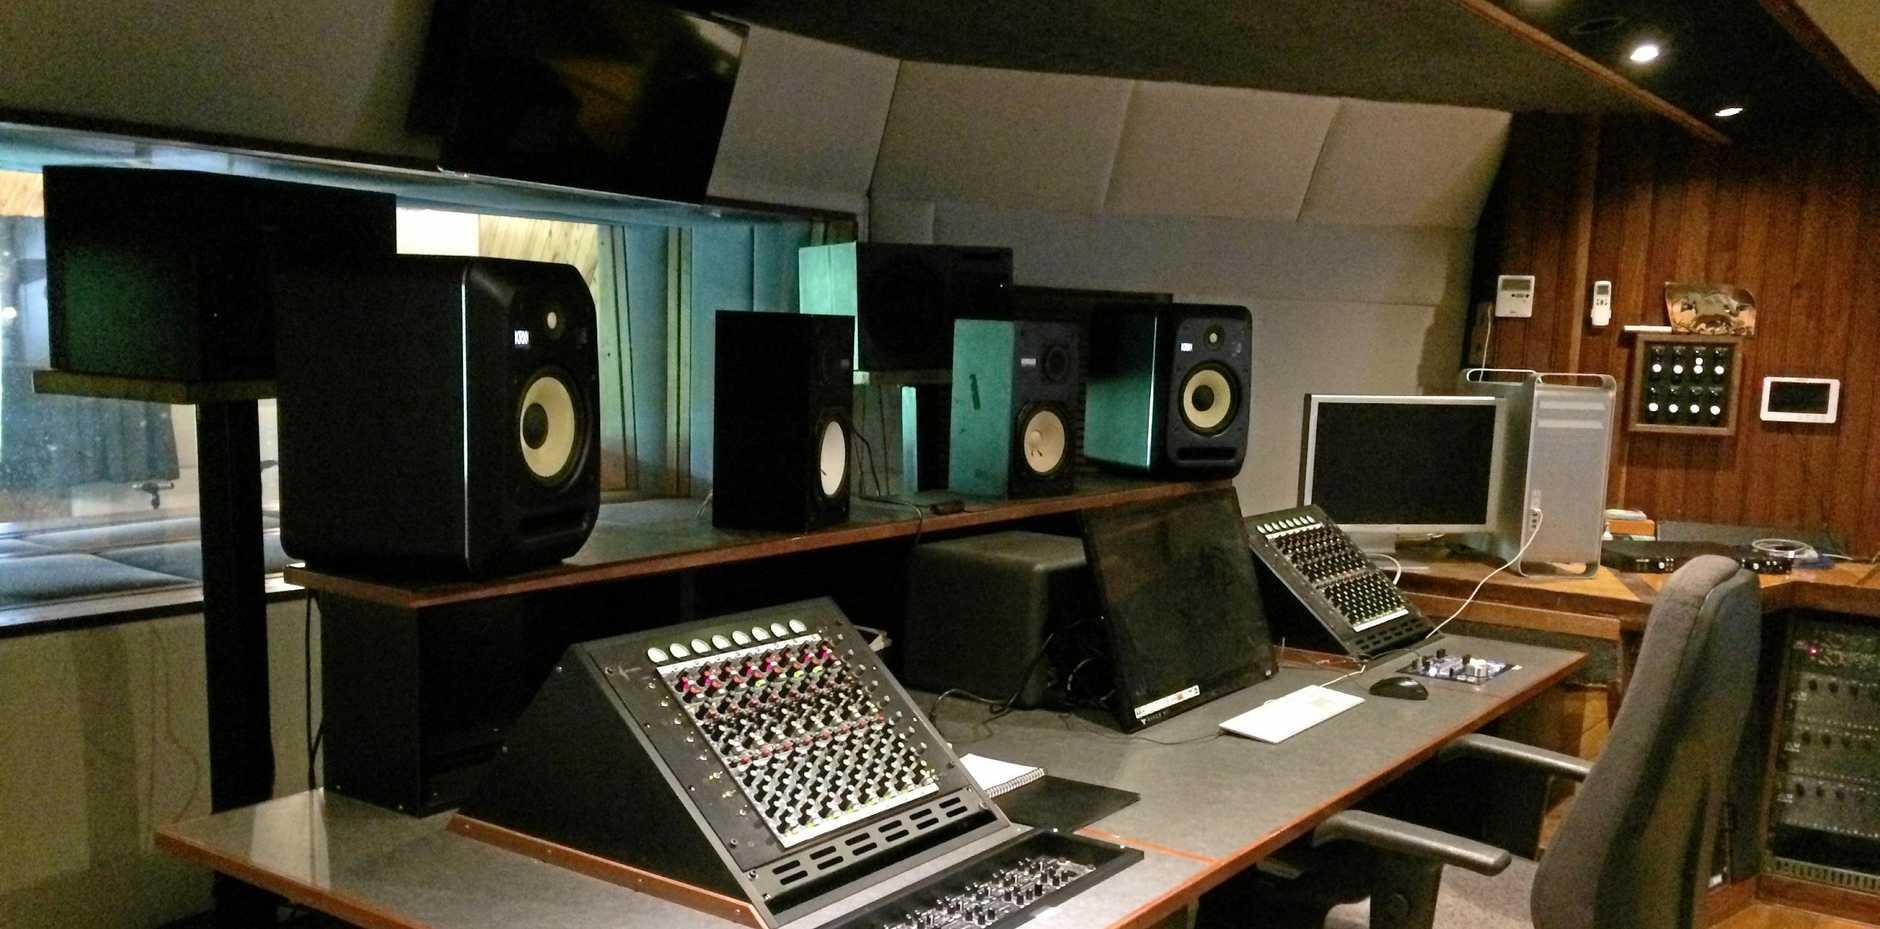 The iconic RockingHorse music studio.